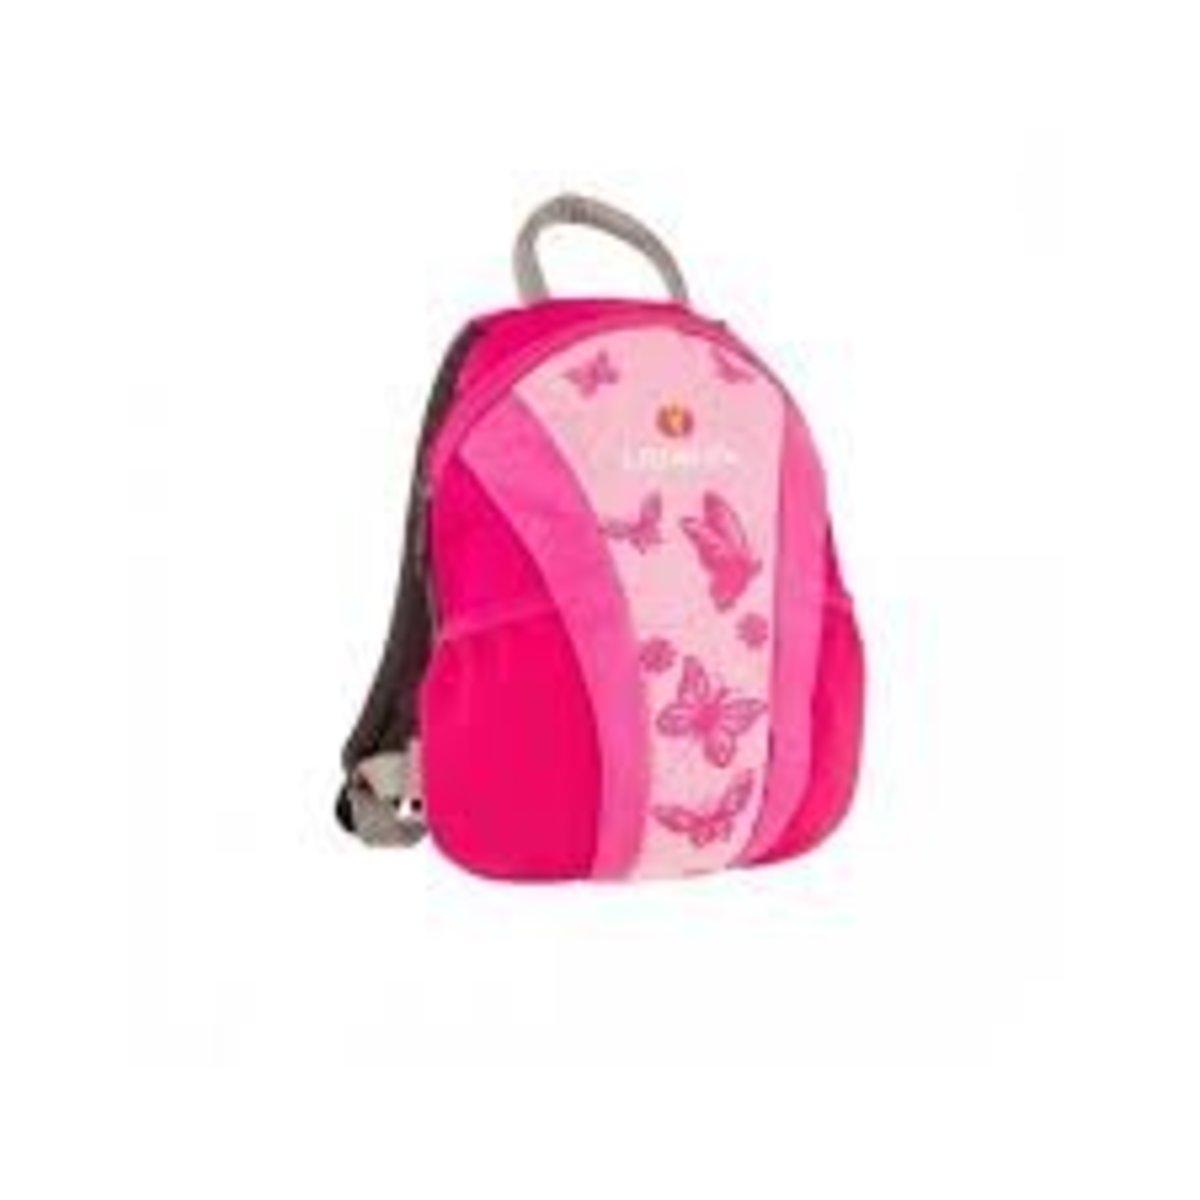 LML Toddler D'sack Runabout Pink